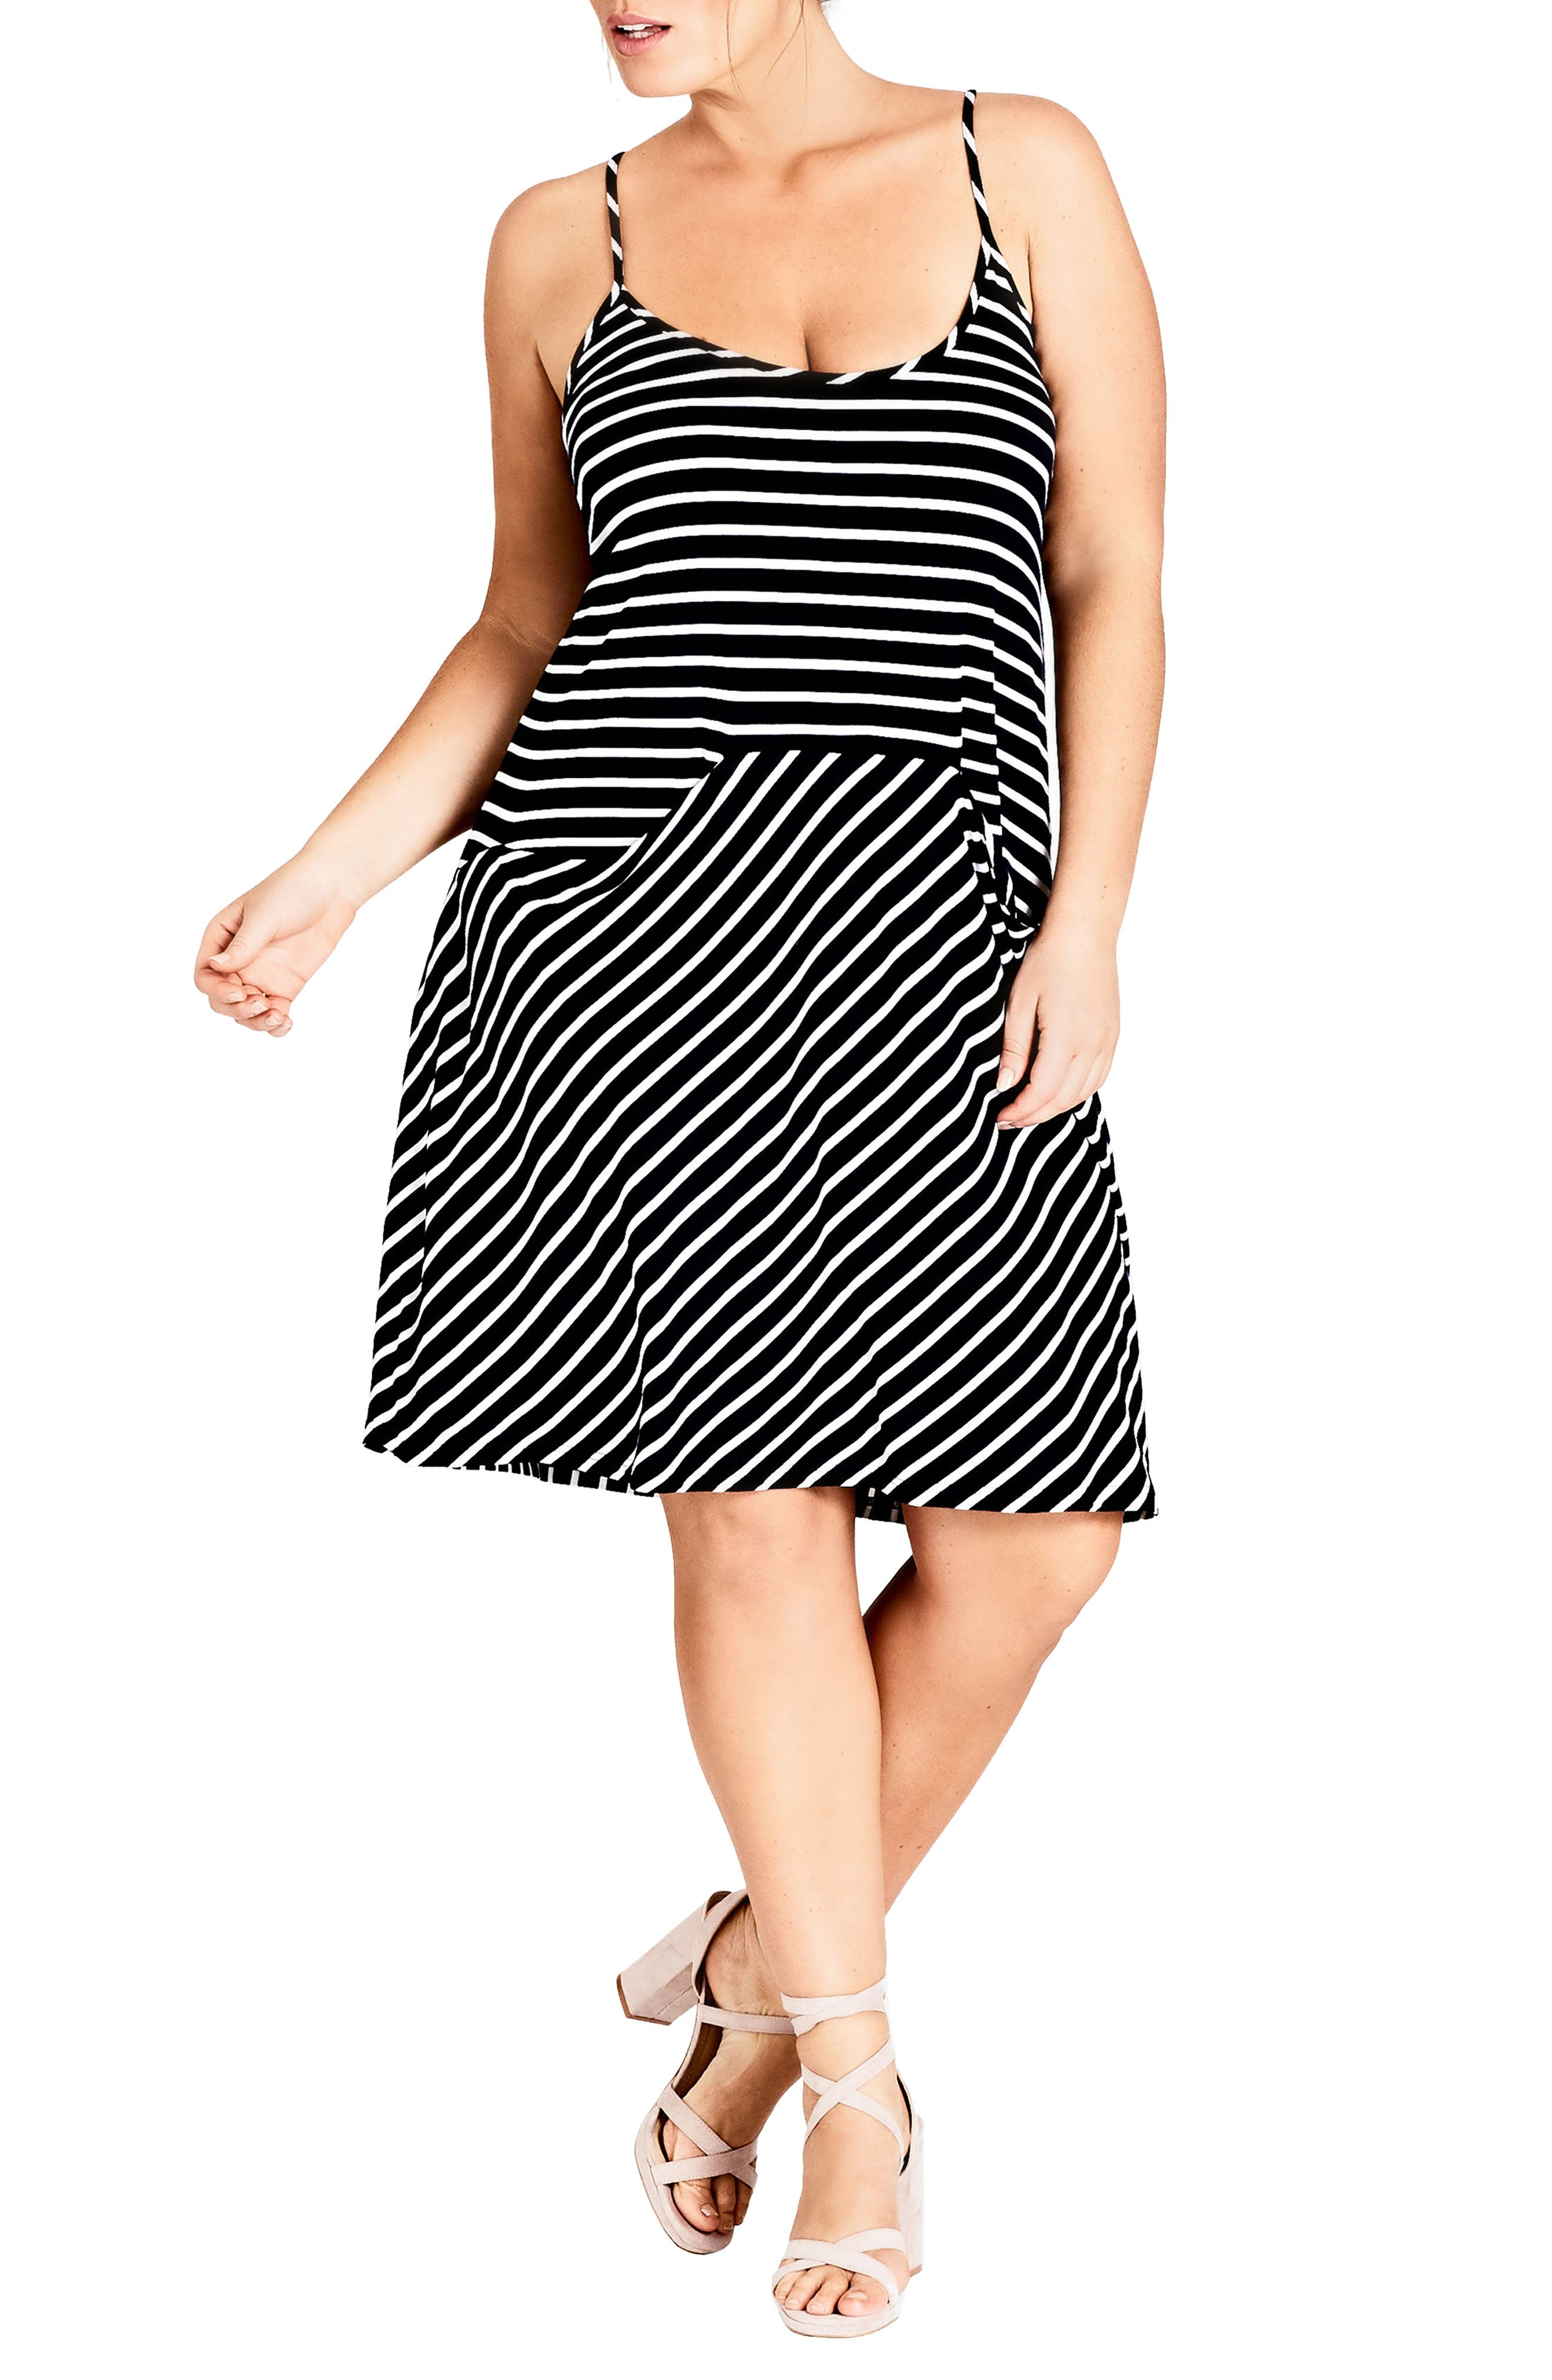 Beachy Days Dress,                             Main thumbnail 1, color,                             BLACK STRIPE